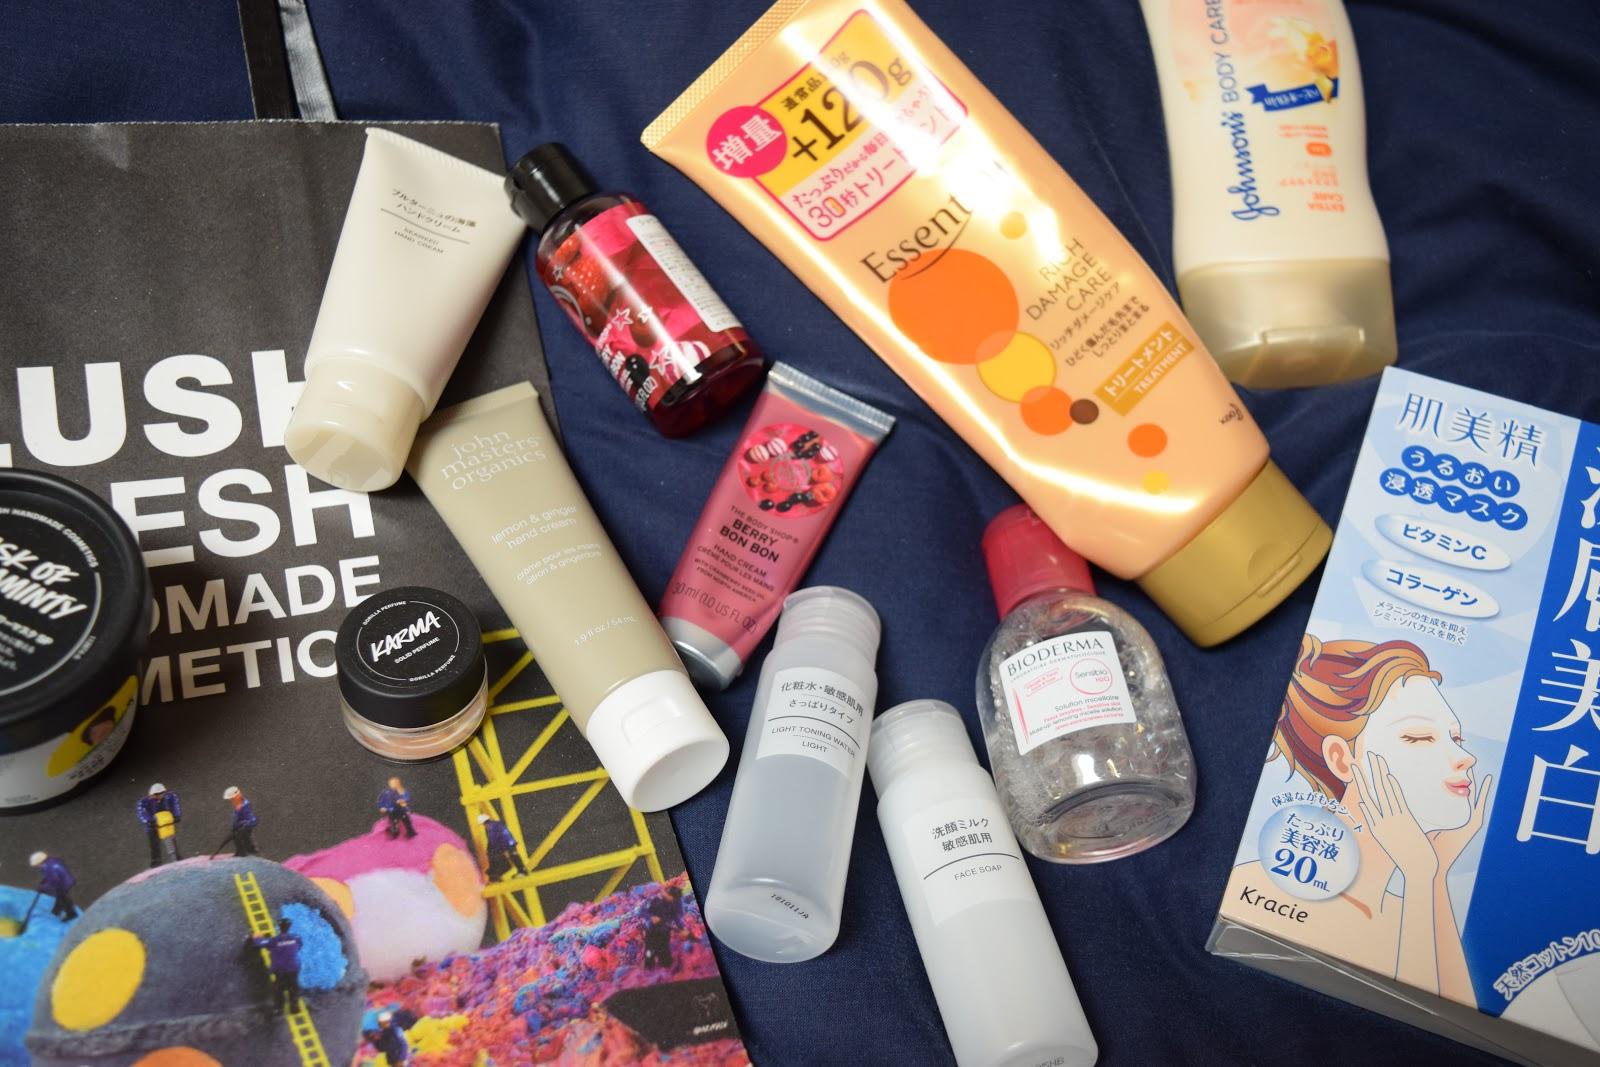 Japanese beauty products flatlay